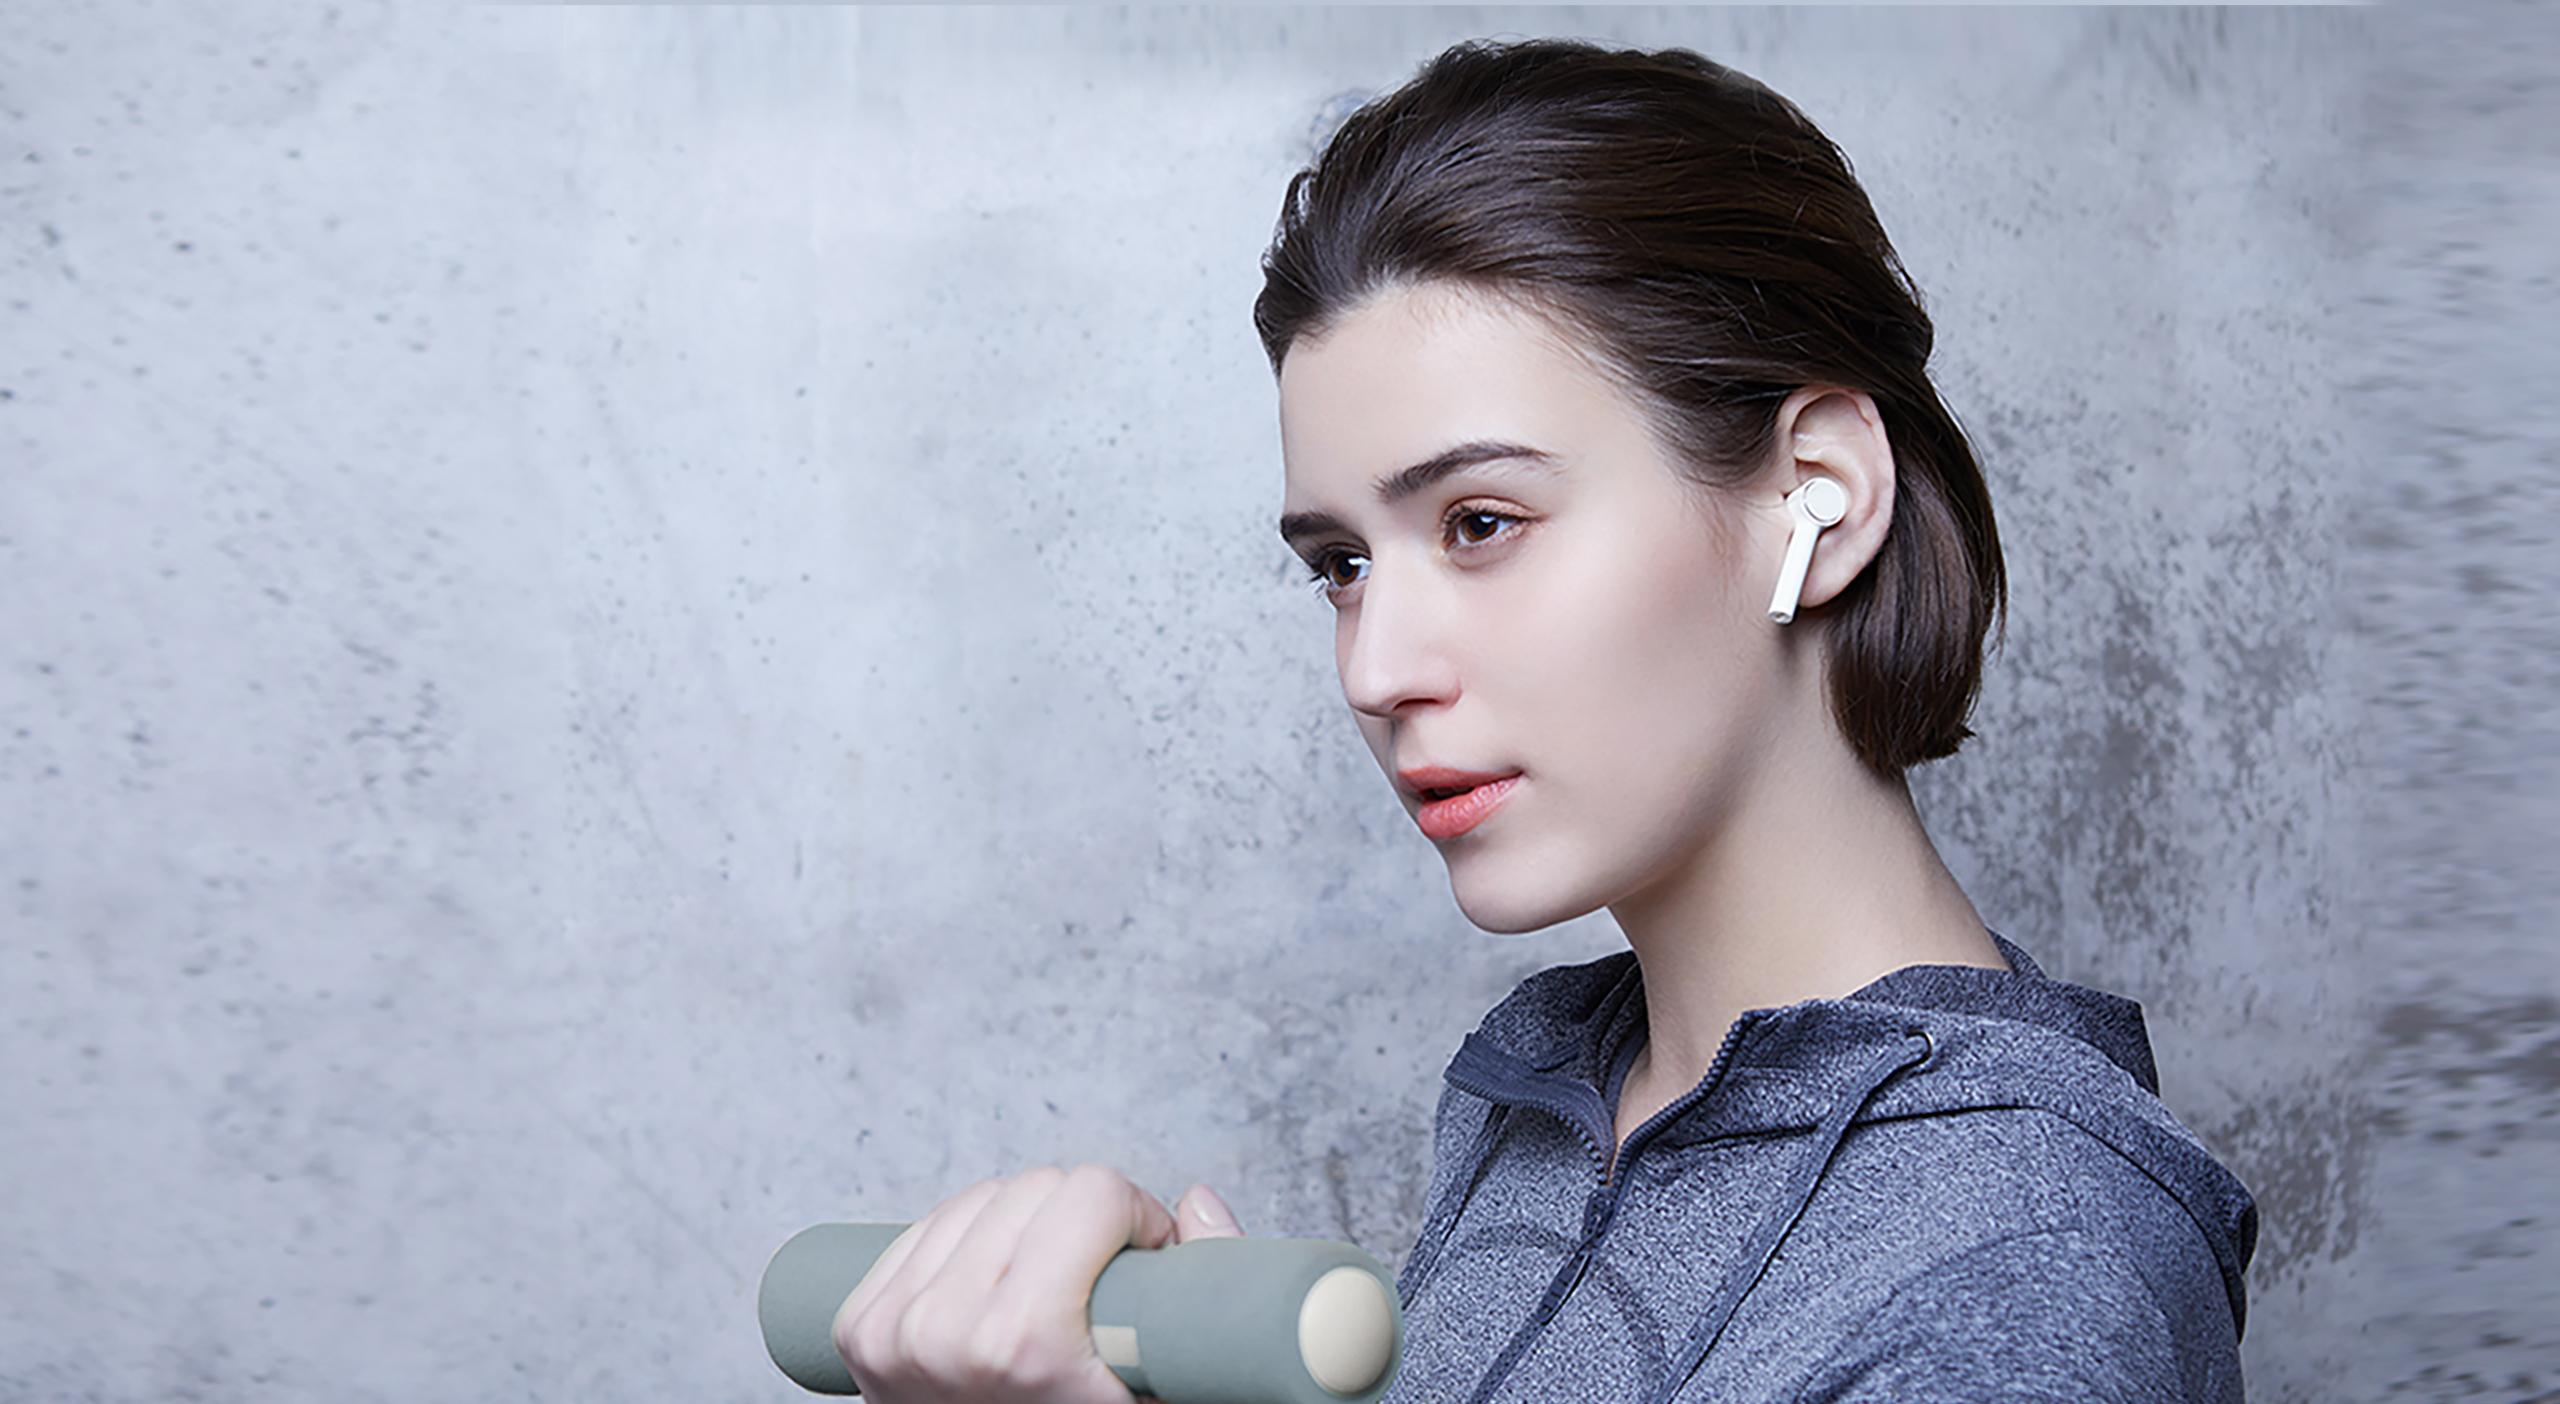 https://i01.appmifile.com/webfile/globalimg/products/pc/mi-true-wireless-earphones/section-06.jpg